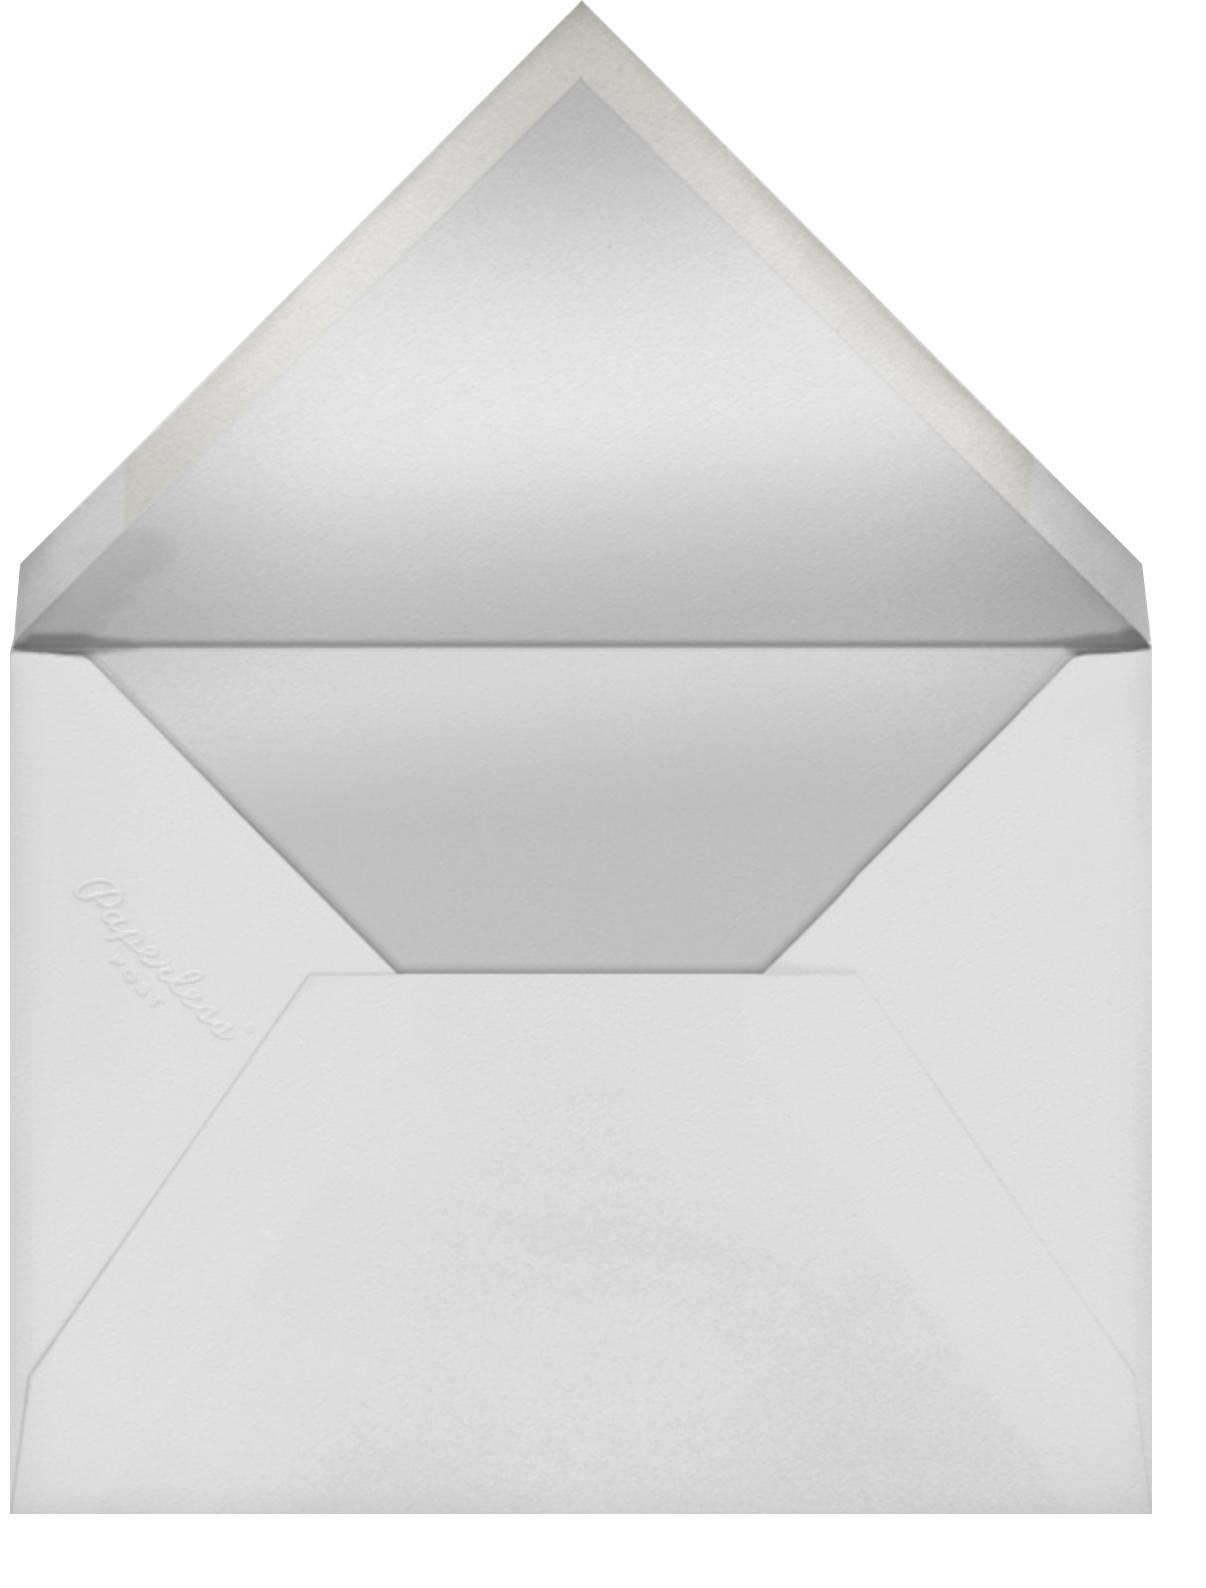 Natural Overprint - Tall - Paperless Post - Envelope